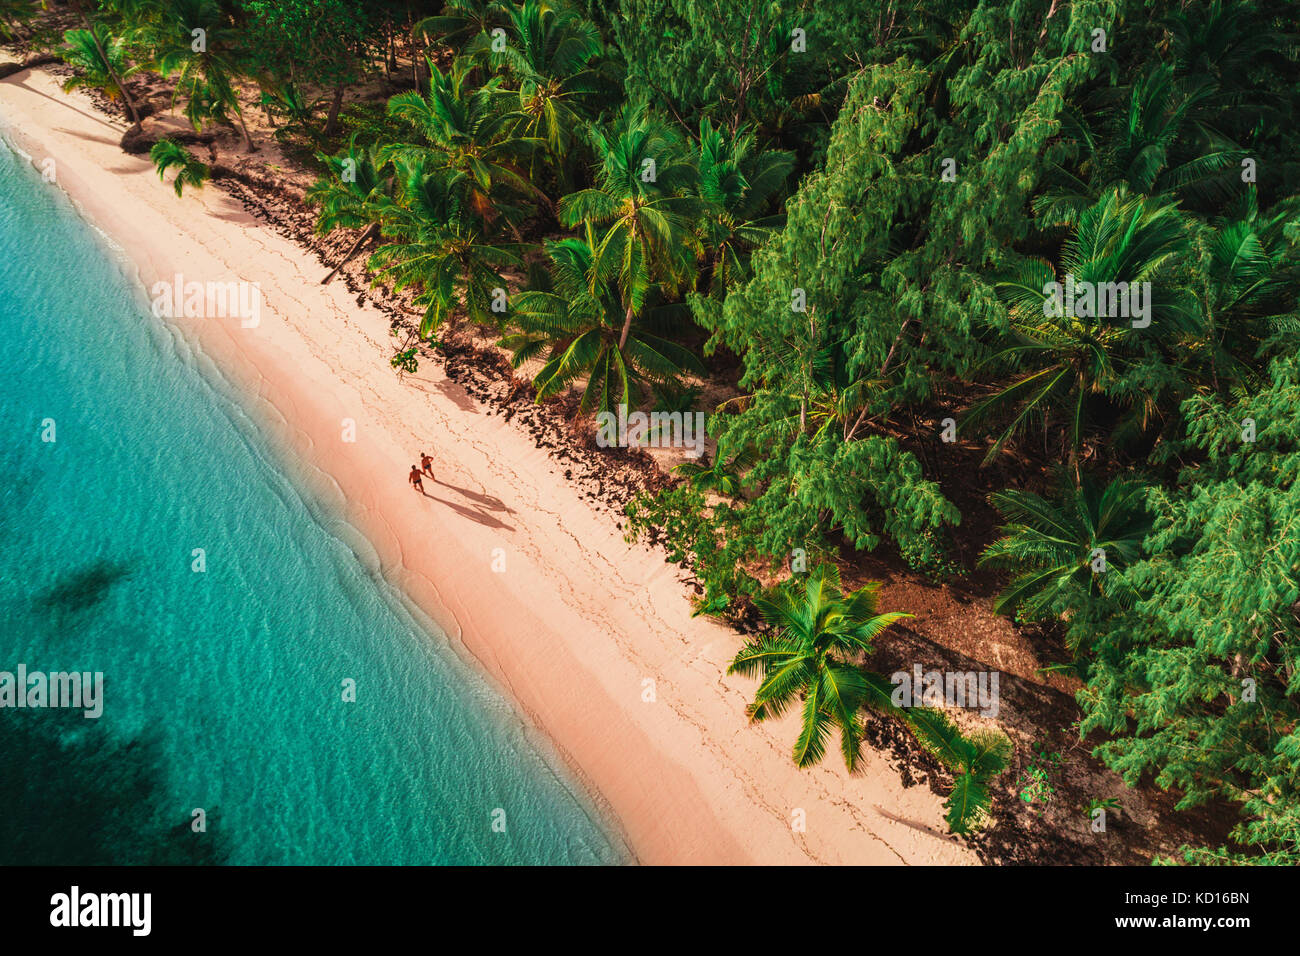 Vista aérea de la isla tropical playa, República Dominicana Imagen De Stock